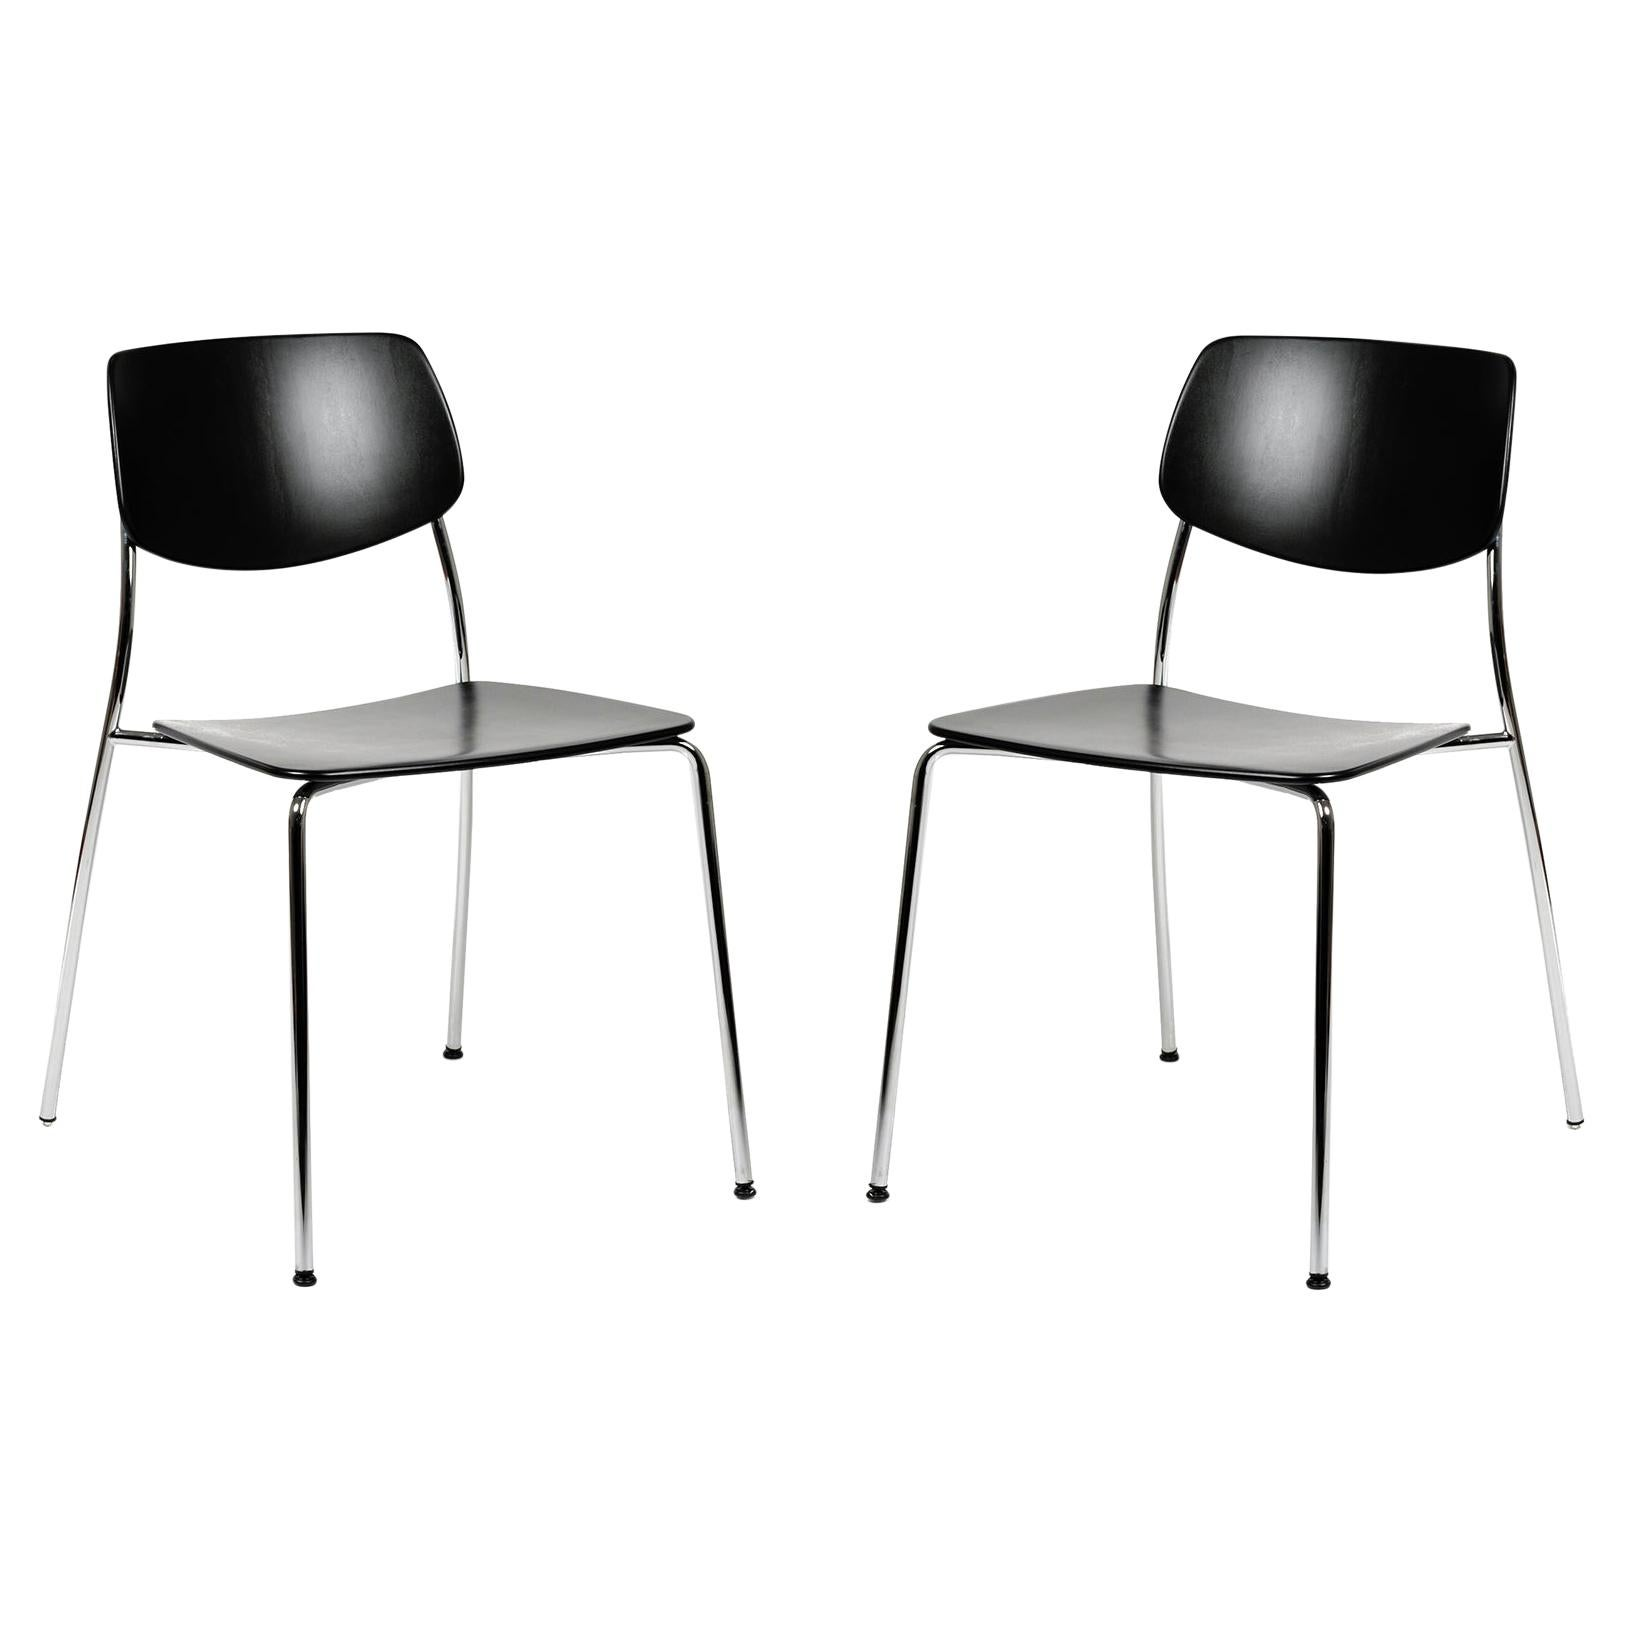 Dietiker Felber C14 Metal Dining Chair, Modular Design, Set of 2